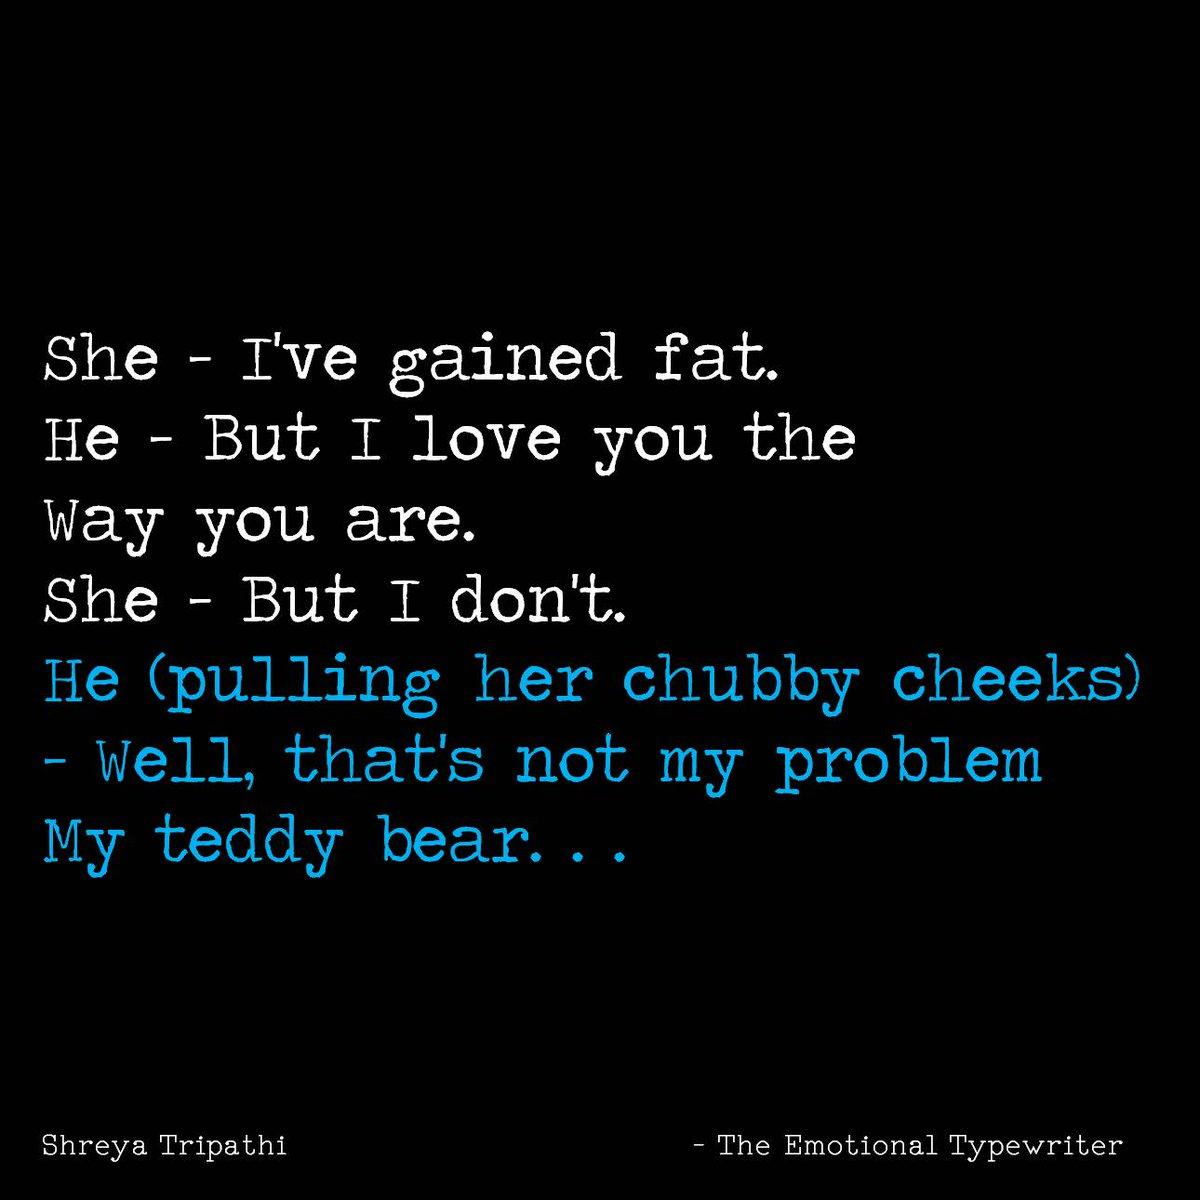 Emotionaltypewriter On Twitter Chubby Teddybear Love Fat